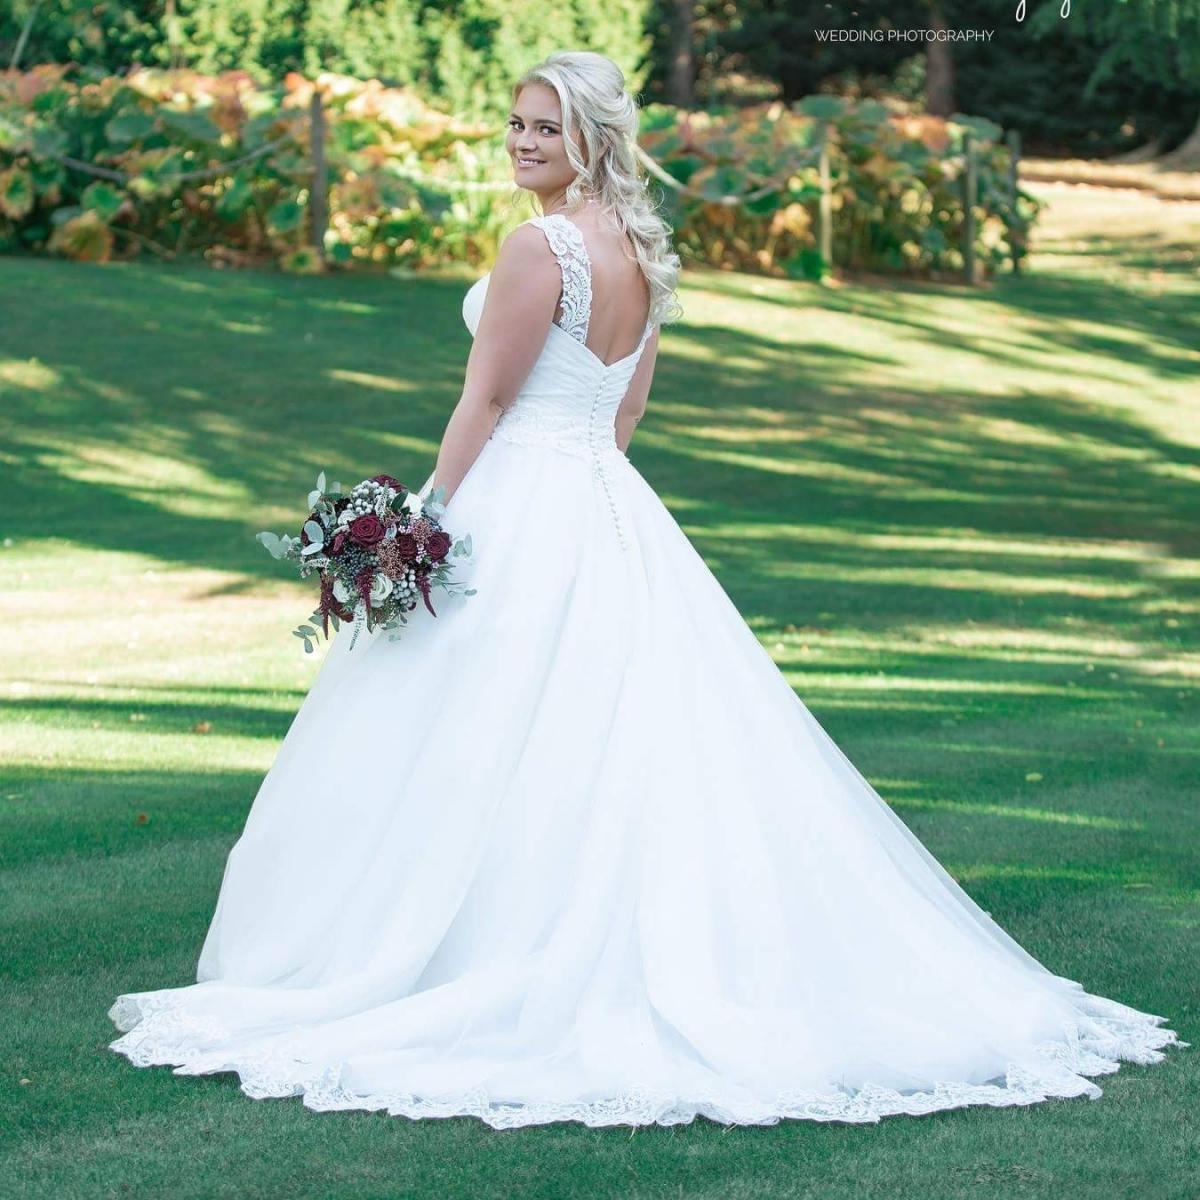 bridal-handtied-wedding-flowers-rugeley-florist-staffordshire-046